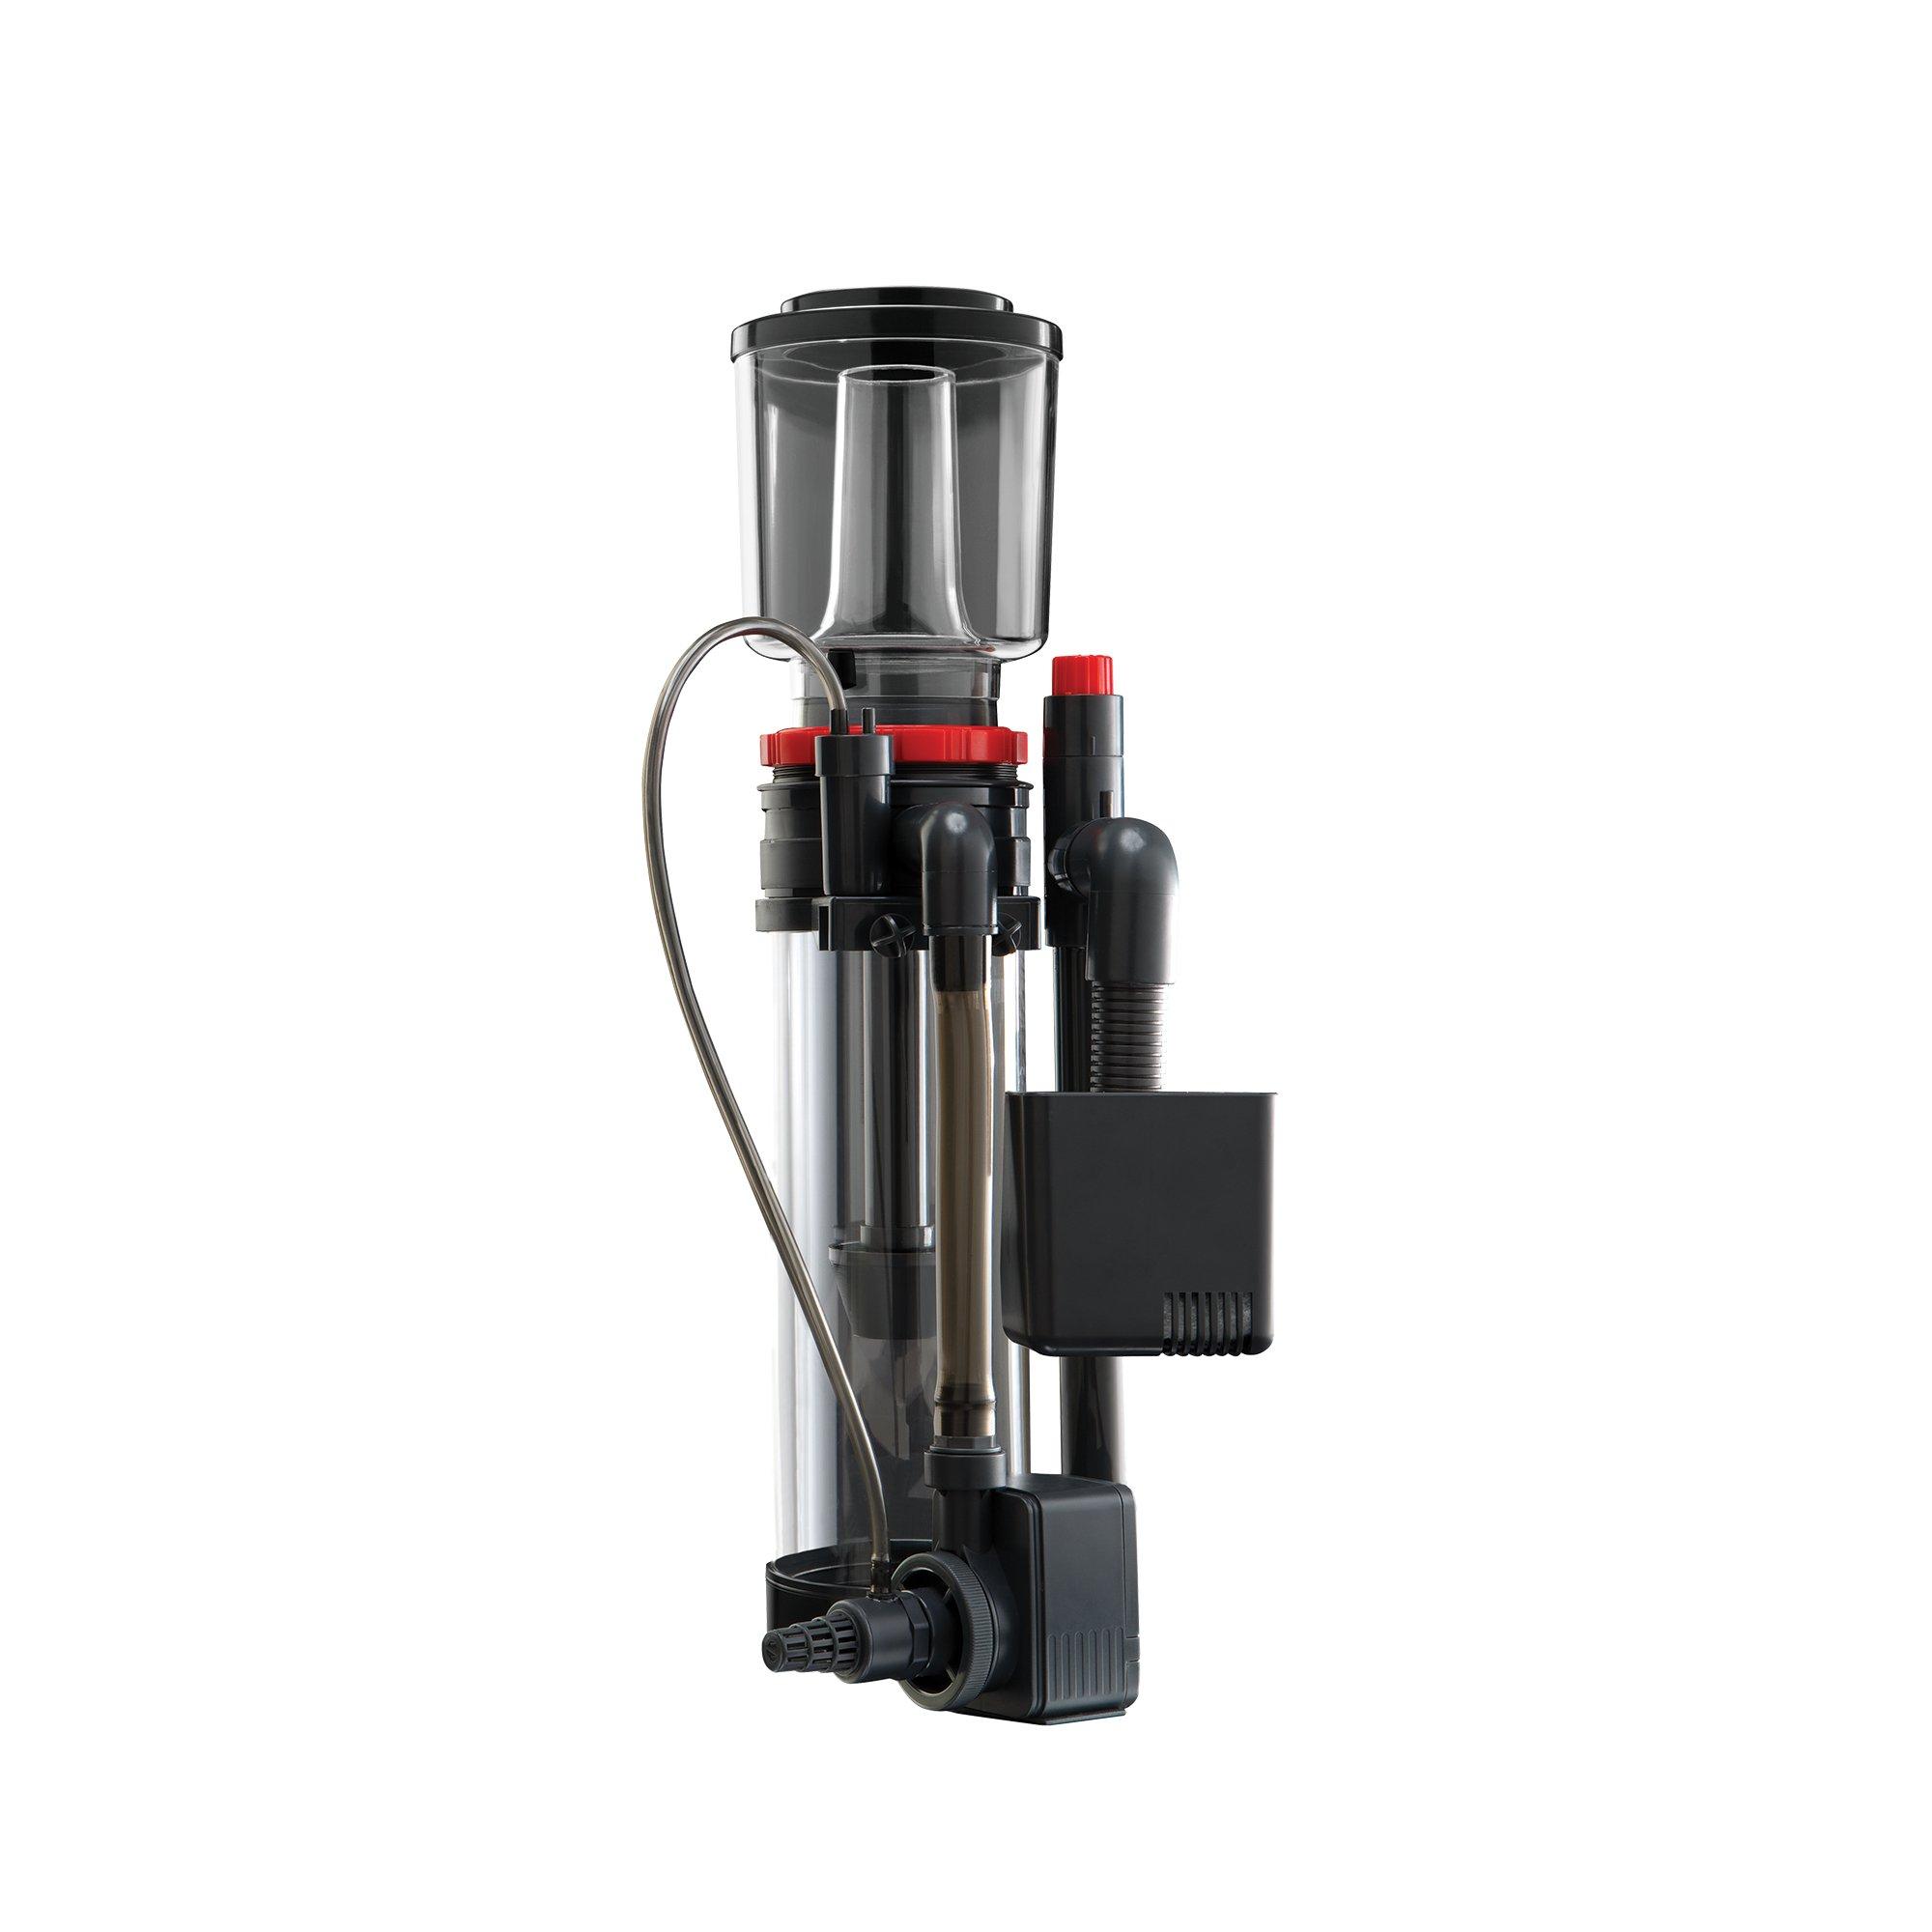 Coralife 05271 Super Skimmer with Pump, 65-Gallon